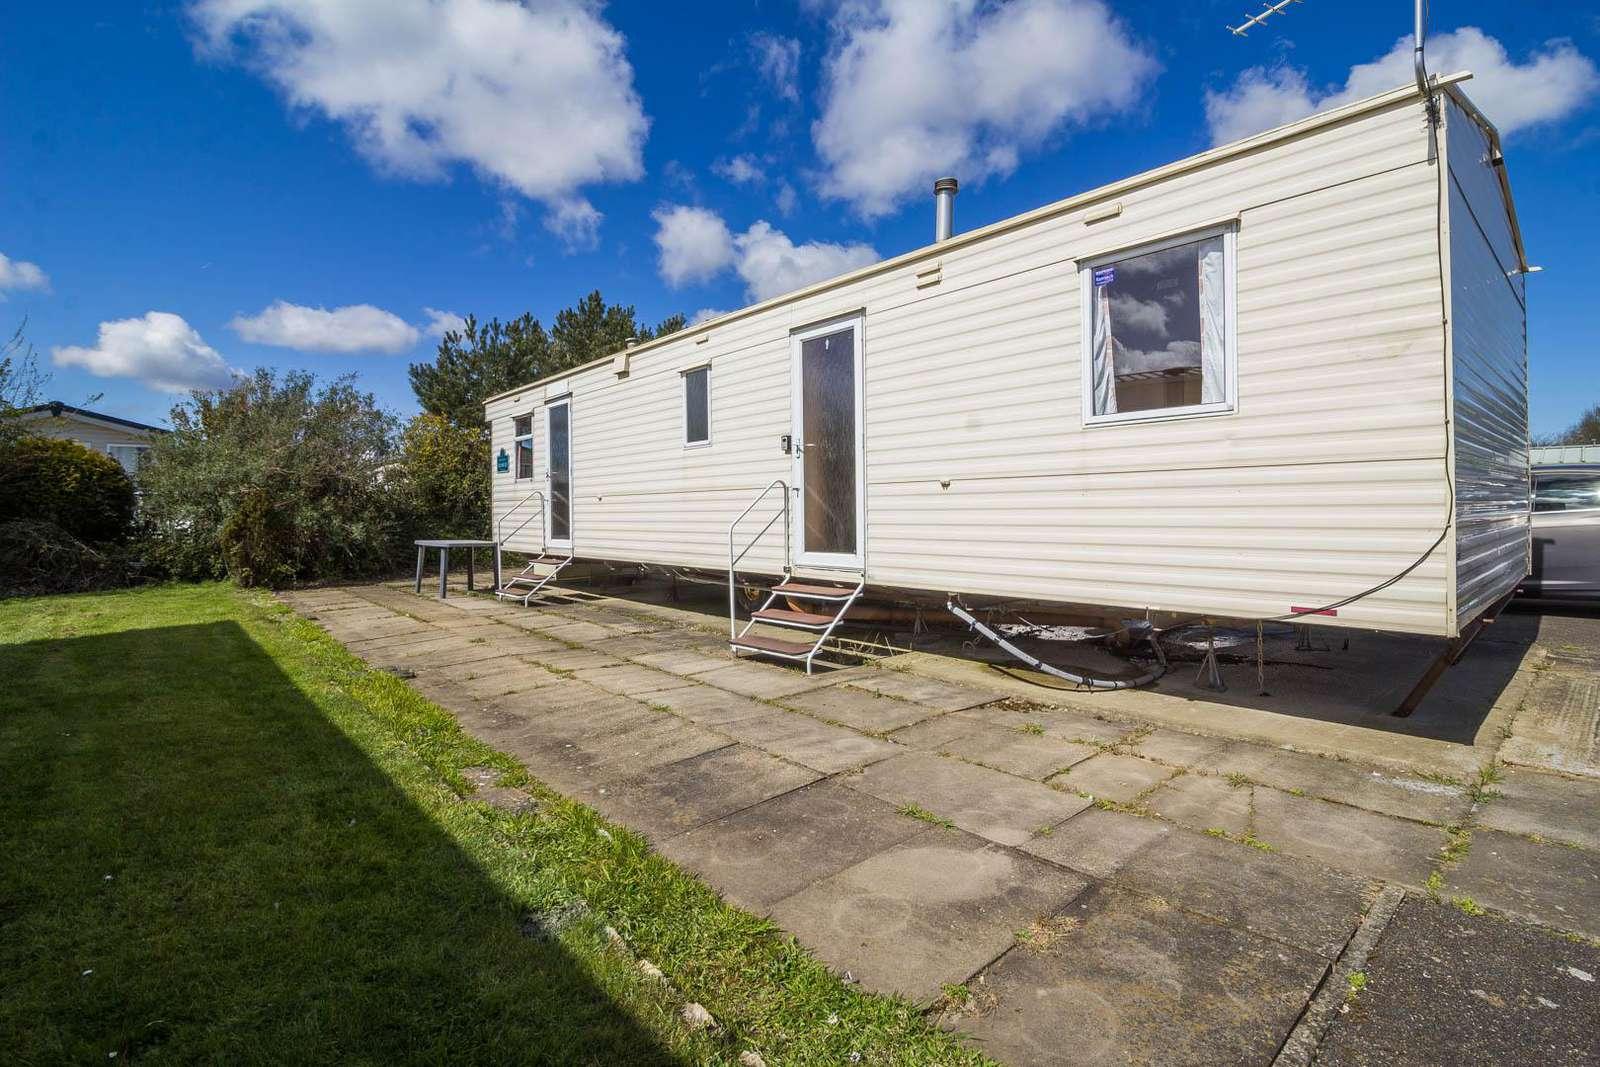 33024V – Vintage area, 3 bed, 8 berth caravan in a quiet area of park. Emerald rated. - property